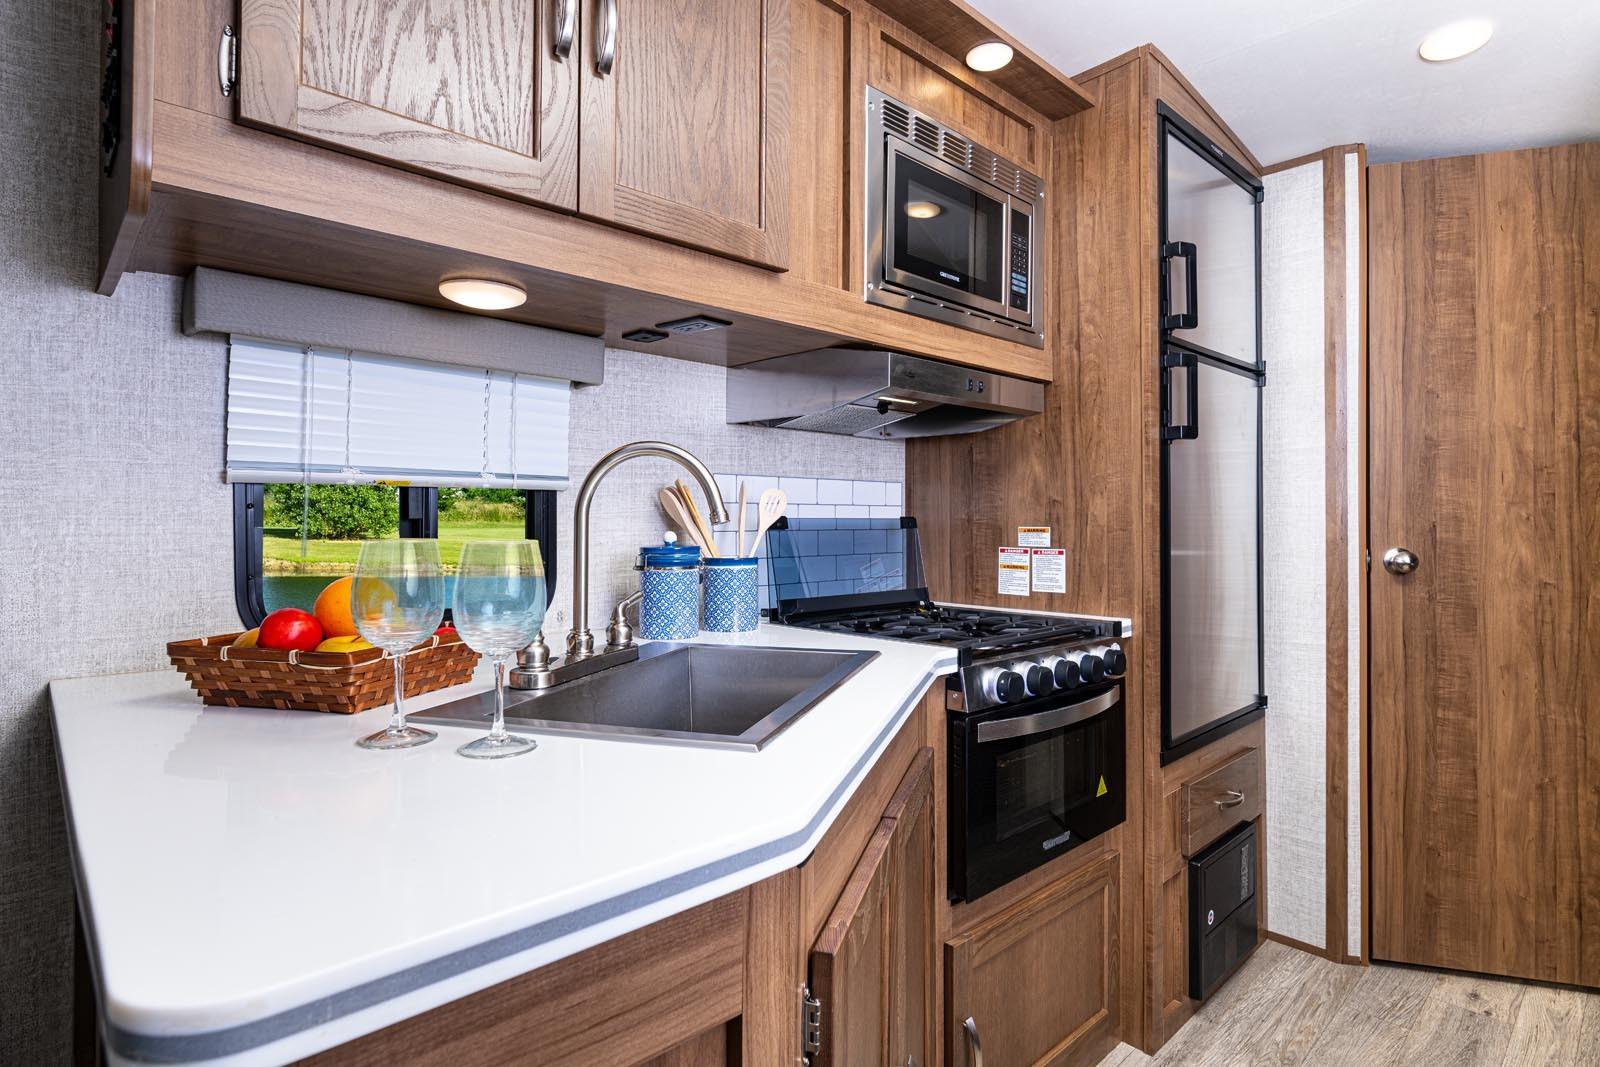 21 23bhs vc kitchen